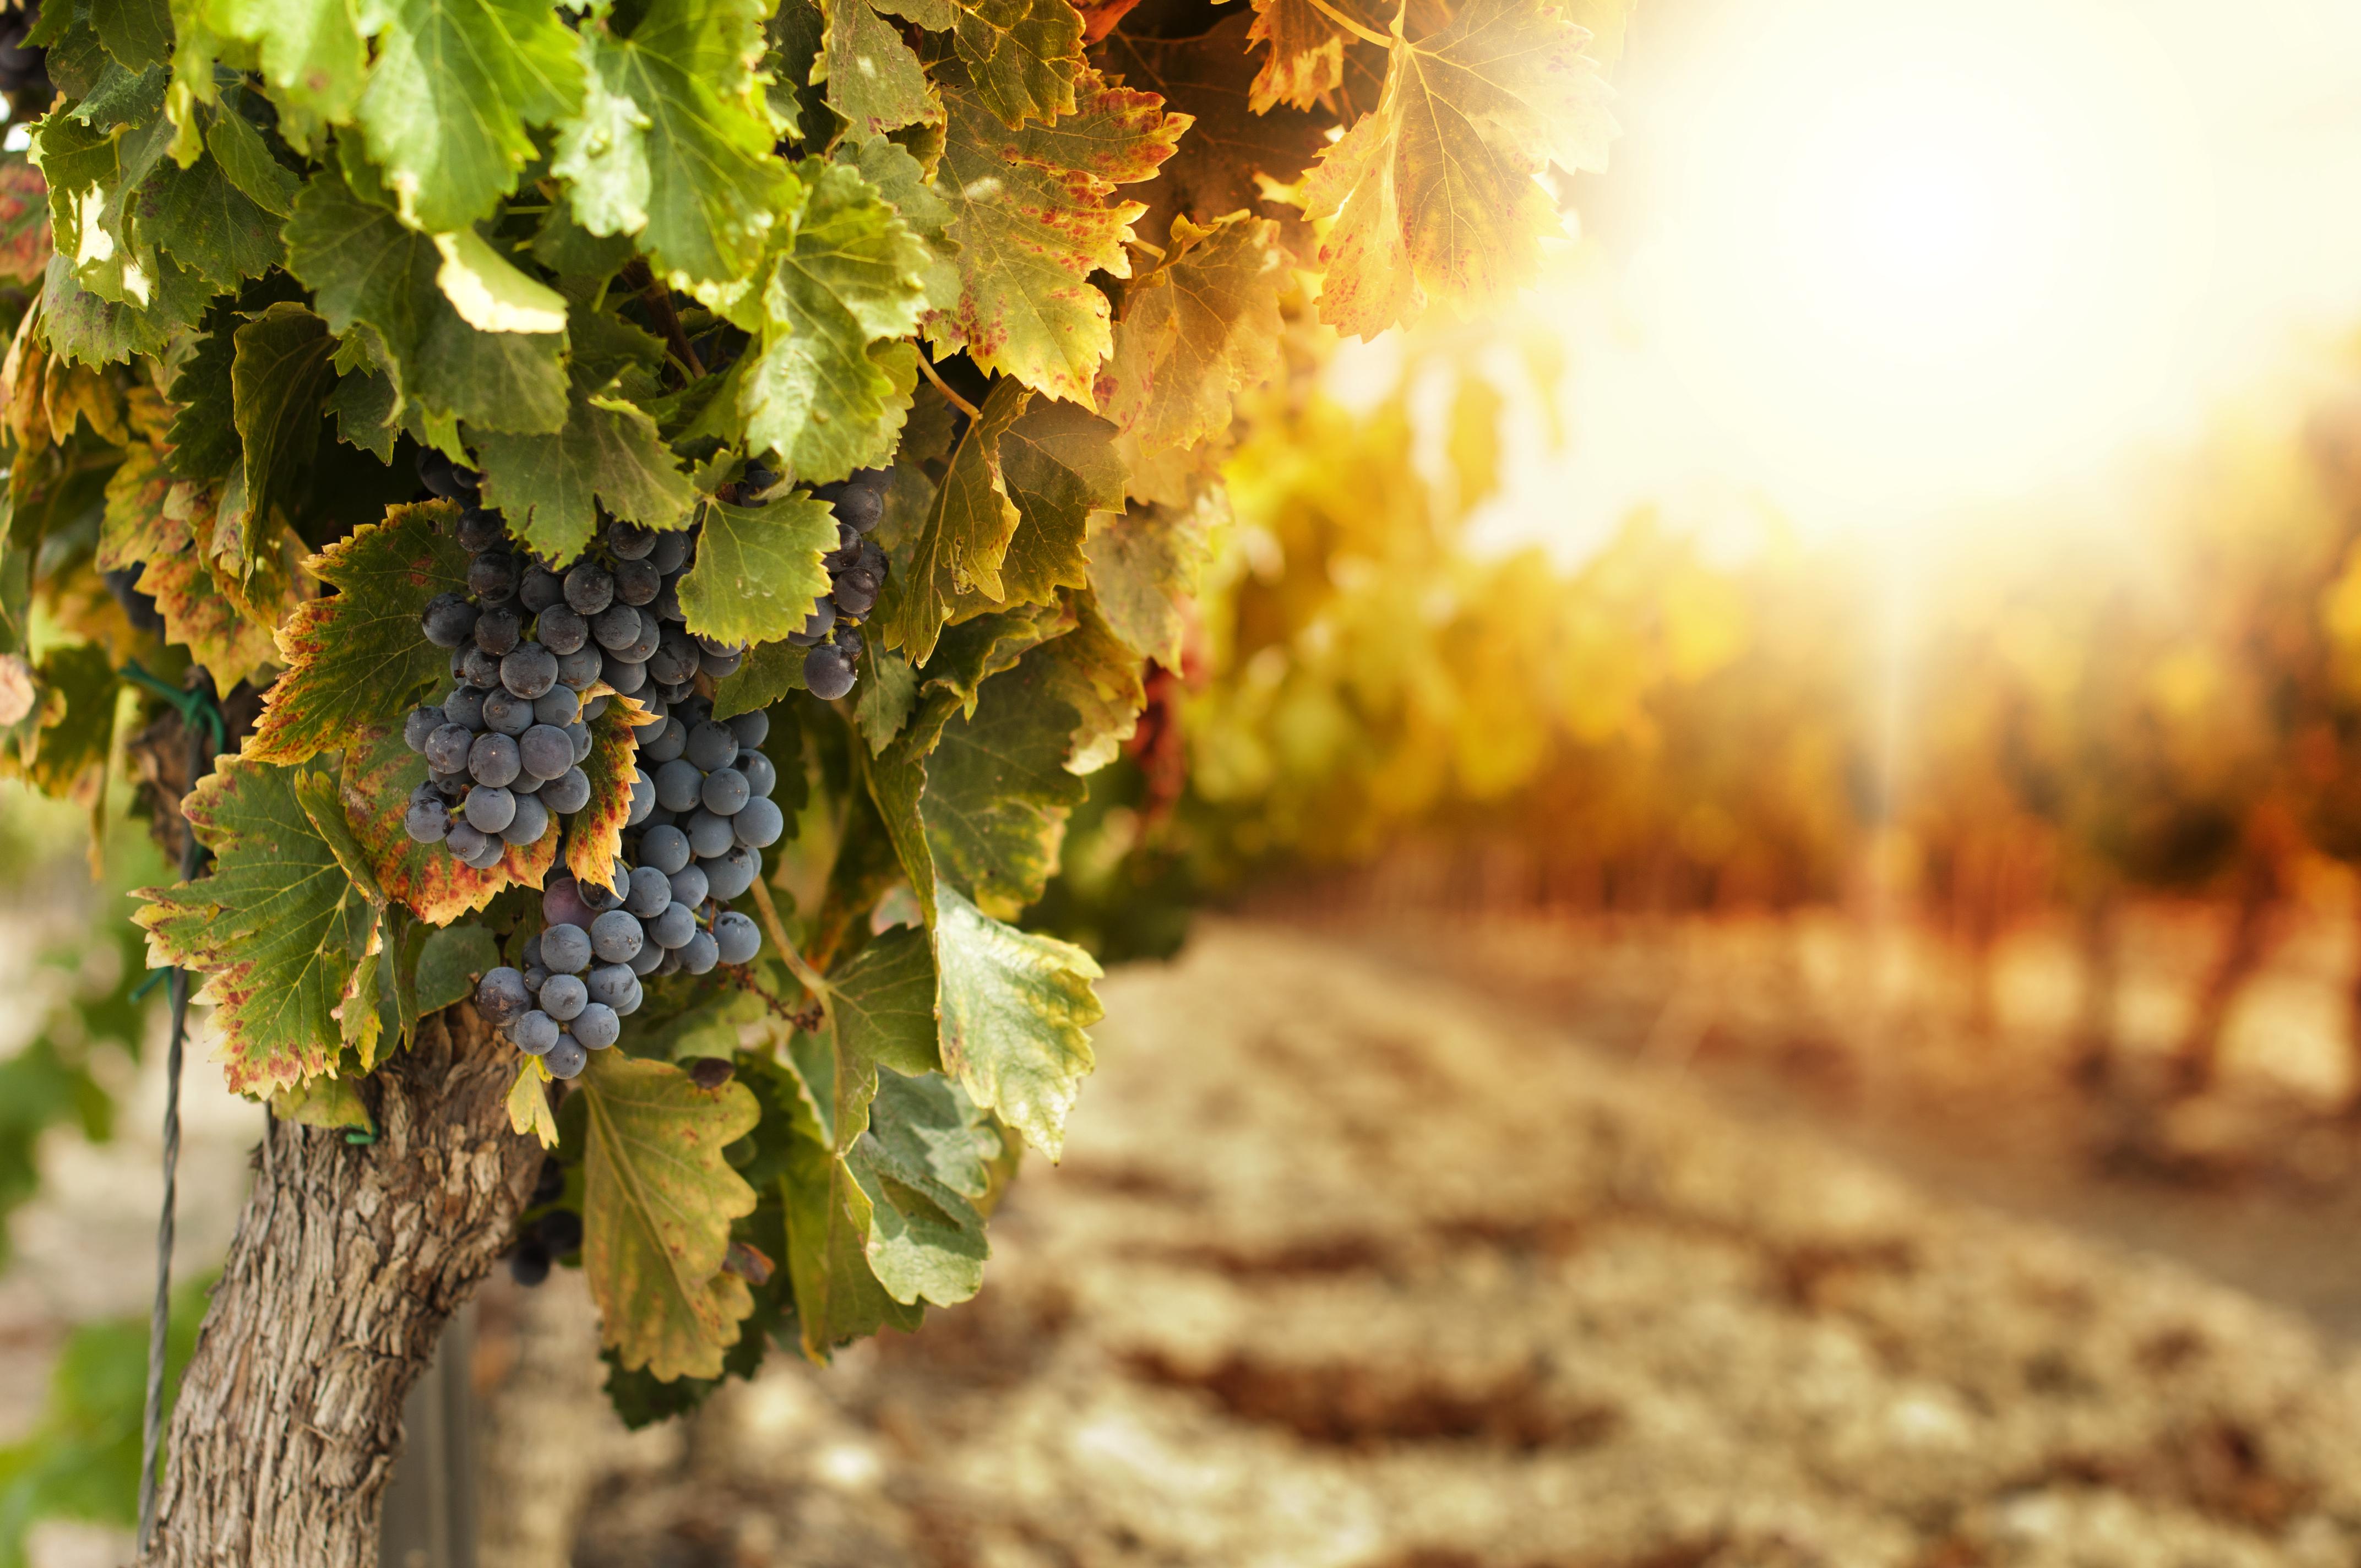 Wine-Vineyards-At-Sunset.jpg